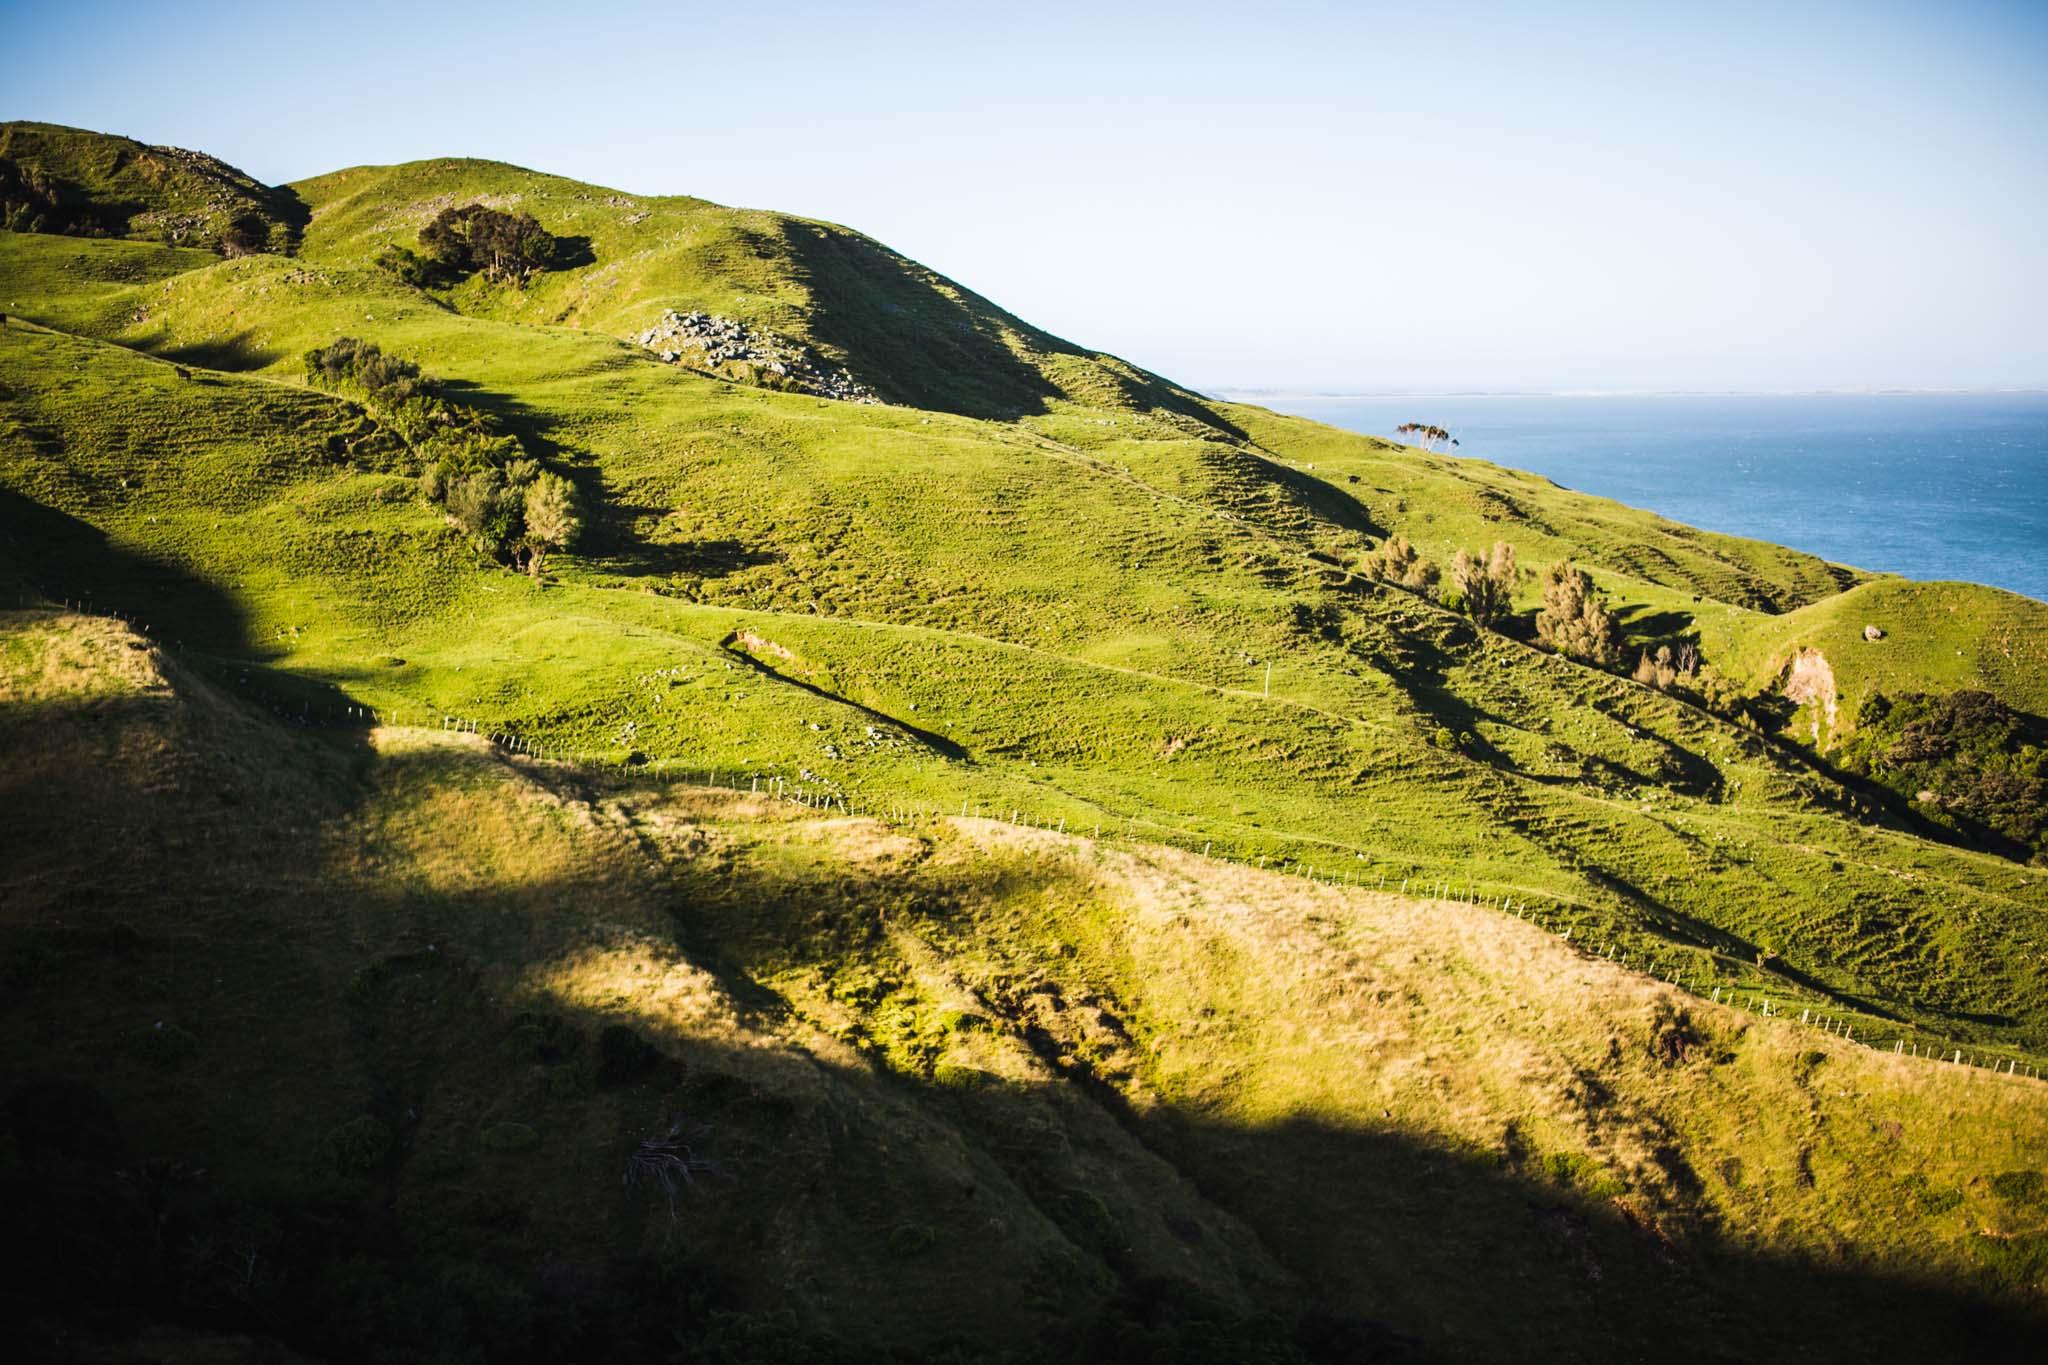 Les collines de Collingwood-New Zealand-Sarah Galvan Photographe